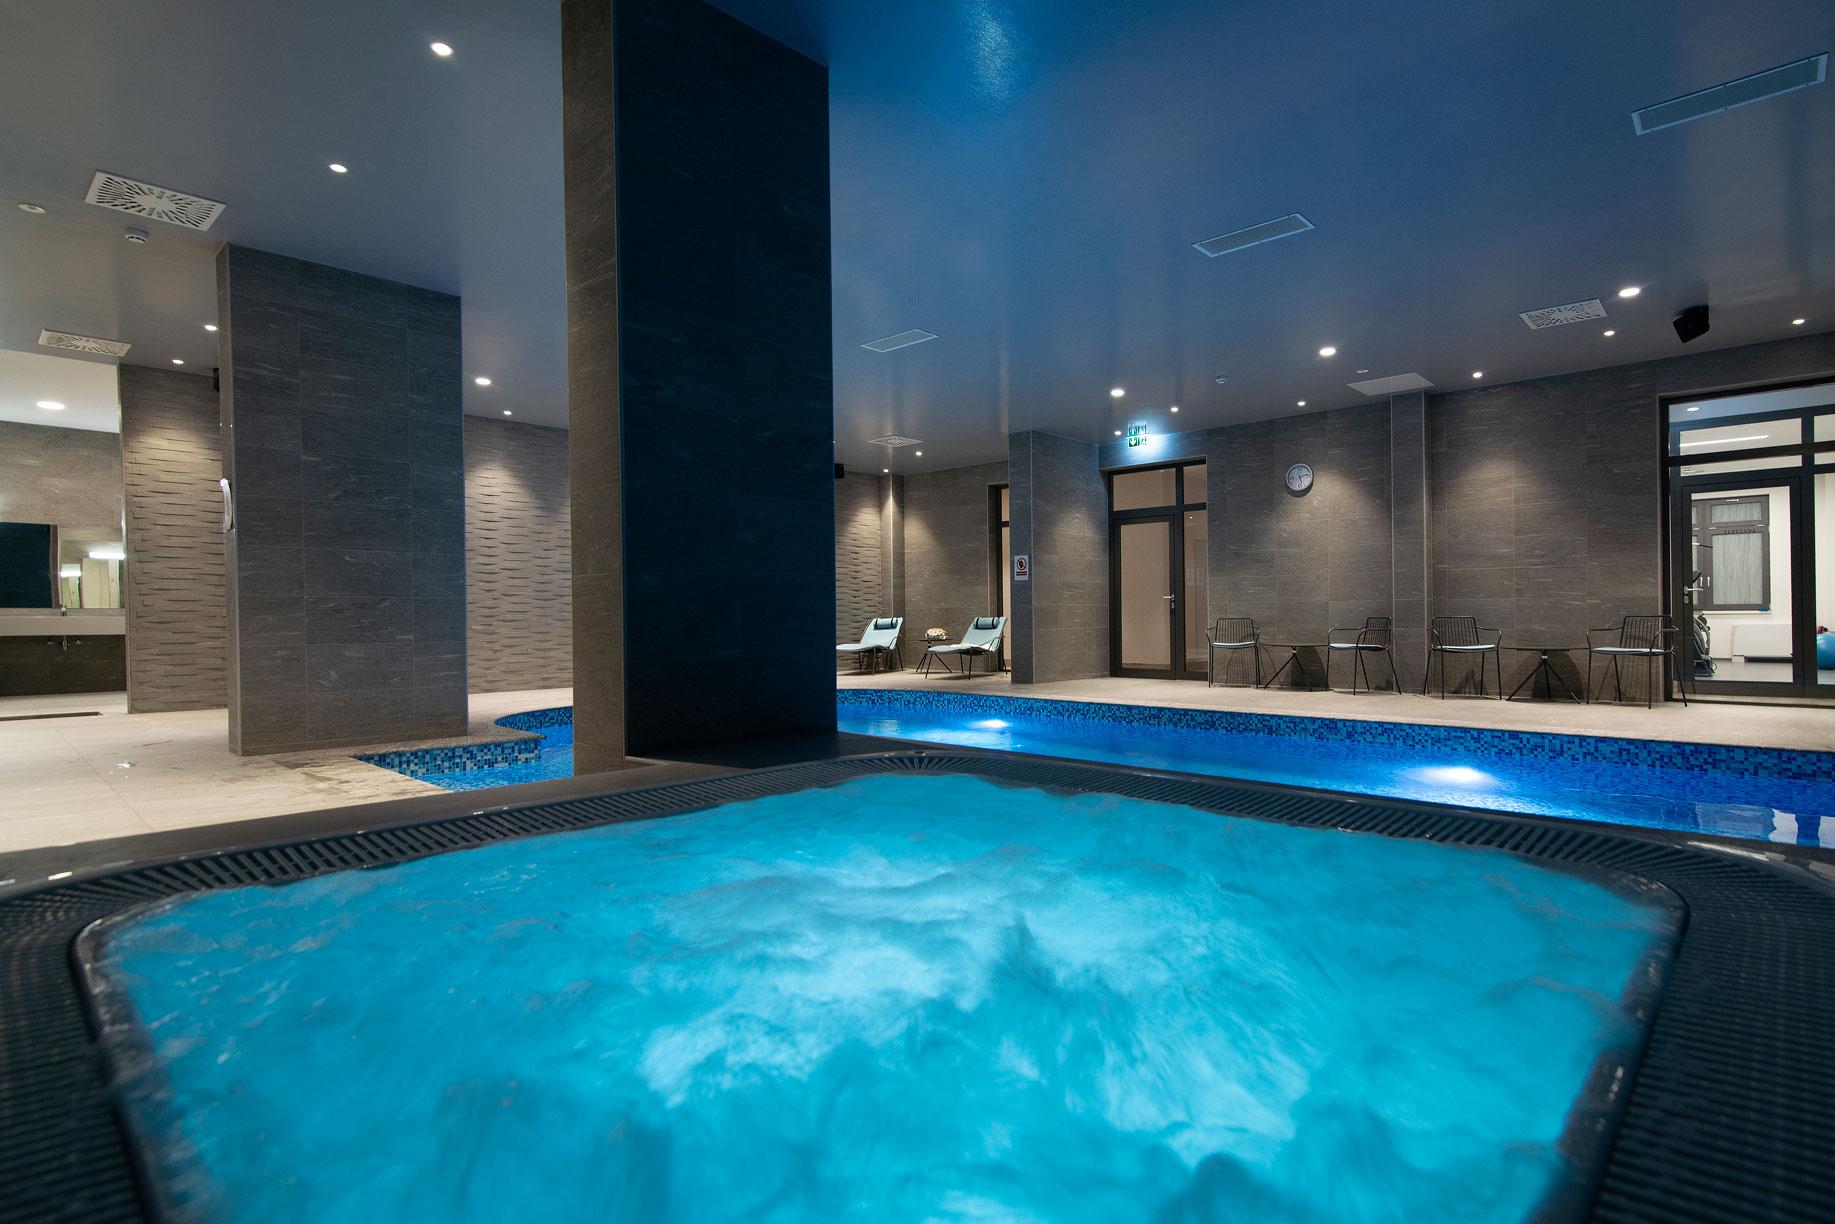 Princess Hotel Luxury Accommodation Value For Money Suburb Of Zagreb